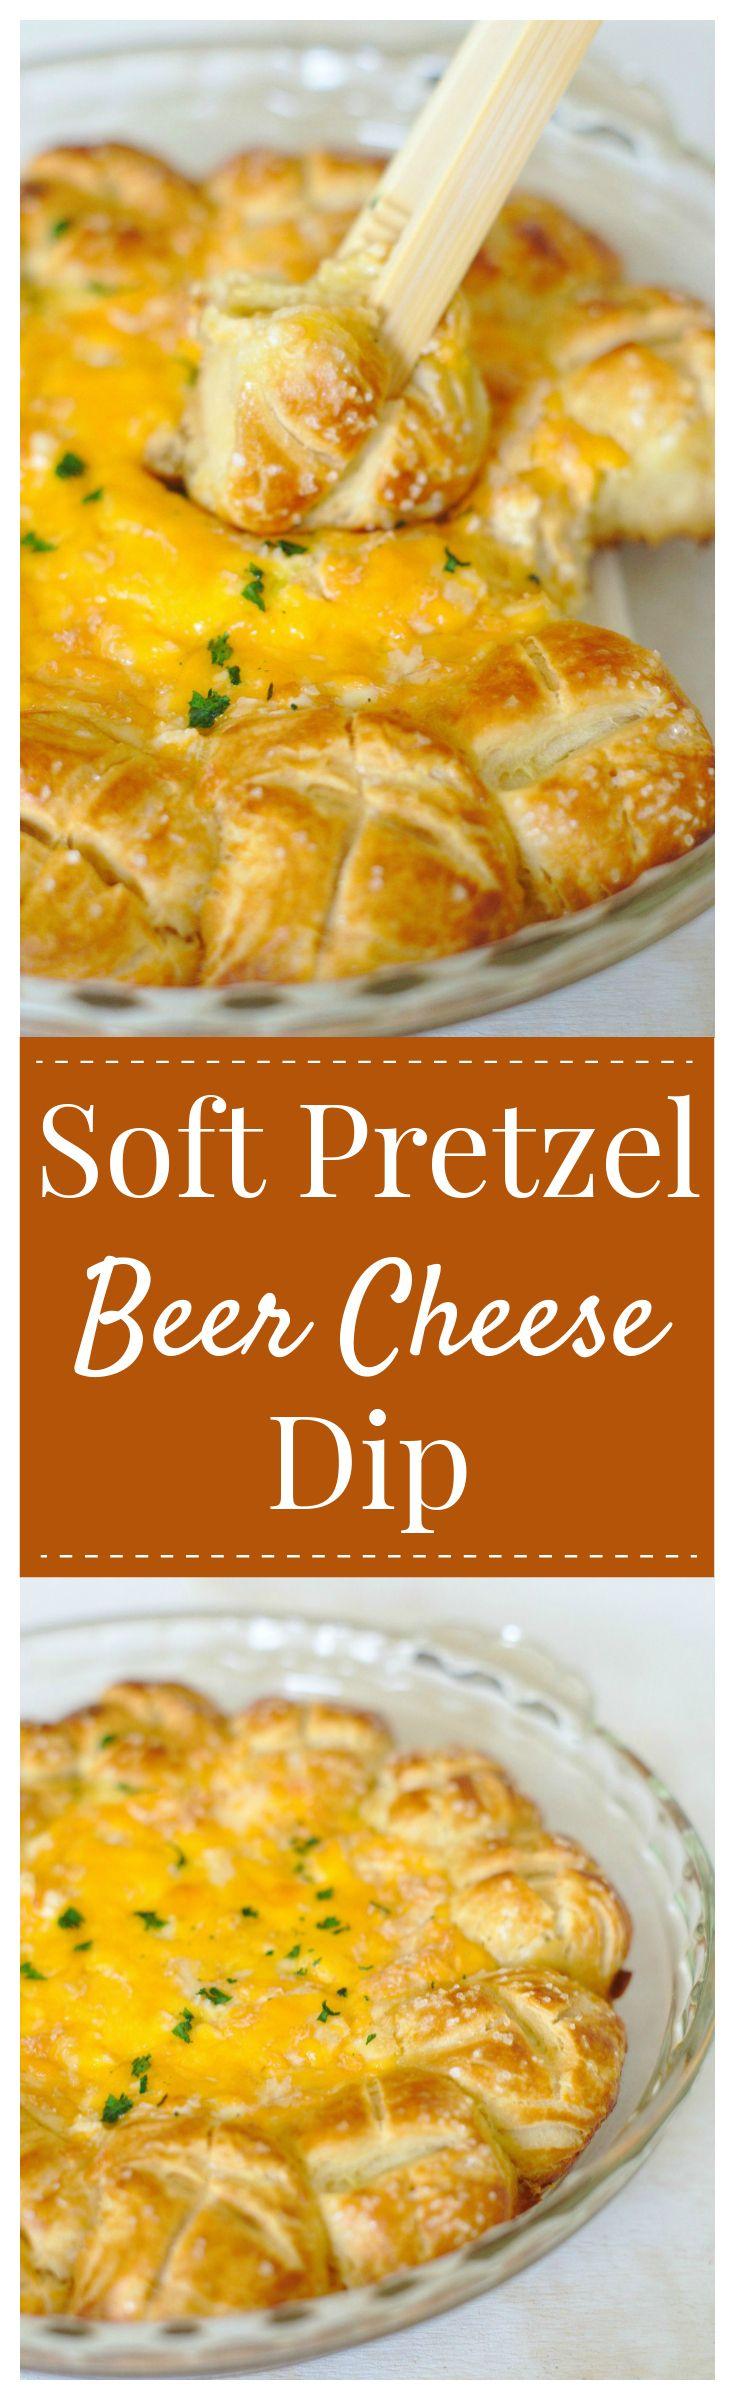 Soft Pretzel Beer Cheese Dip